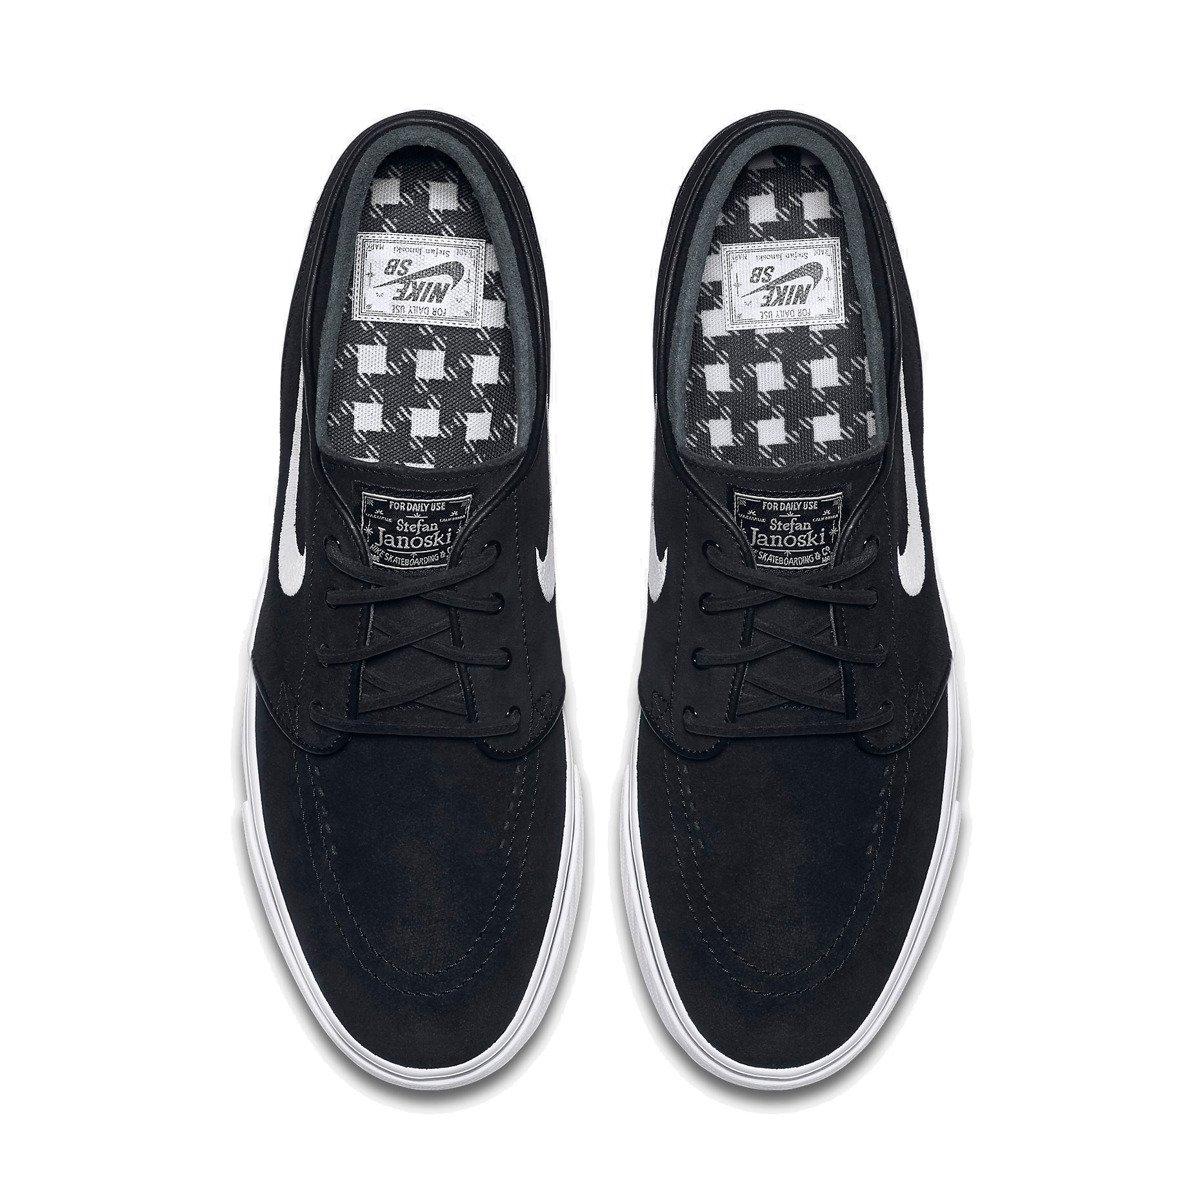 save off 64d4d e3ad0 ... shoes Nike SB Air Zoom Stefan Janoski OG blackwhite-gum light brown  Click to zoom ...